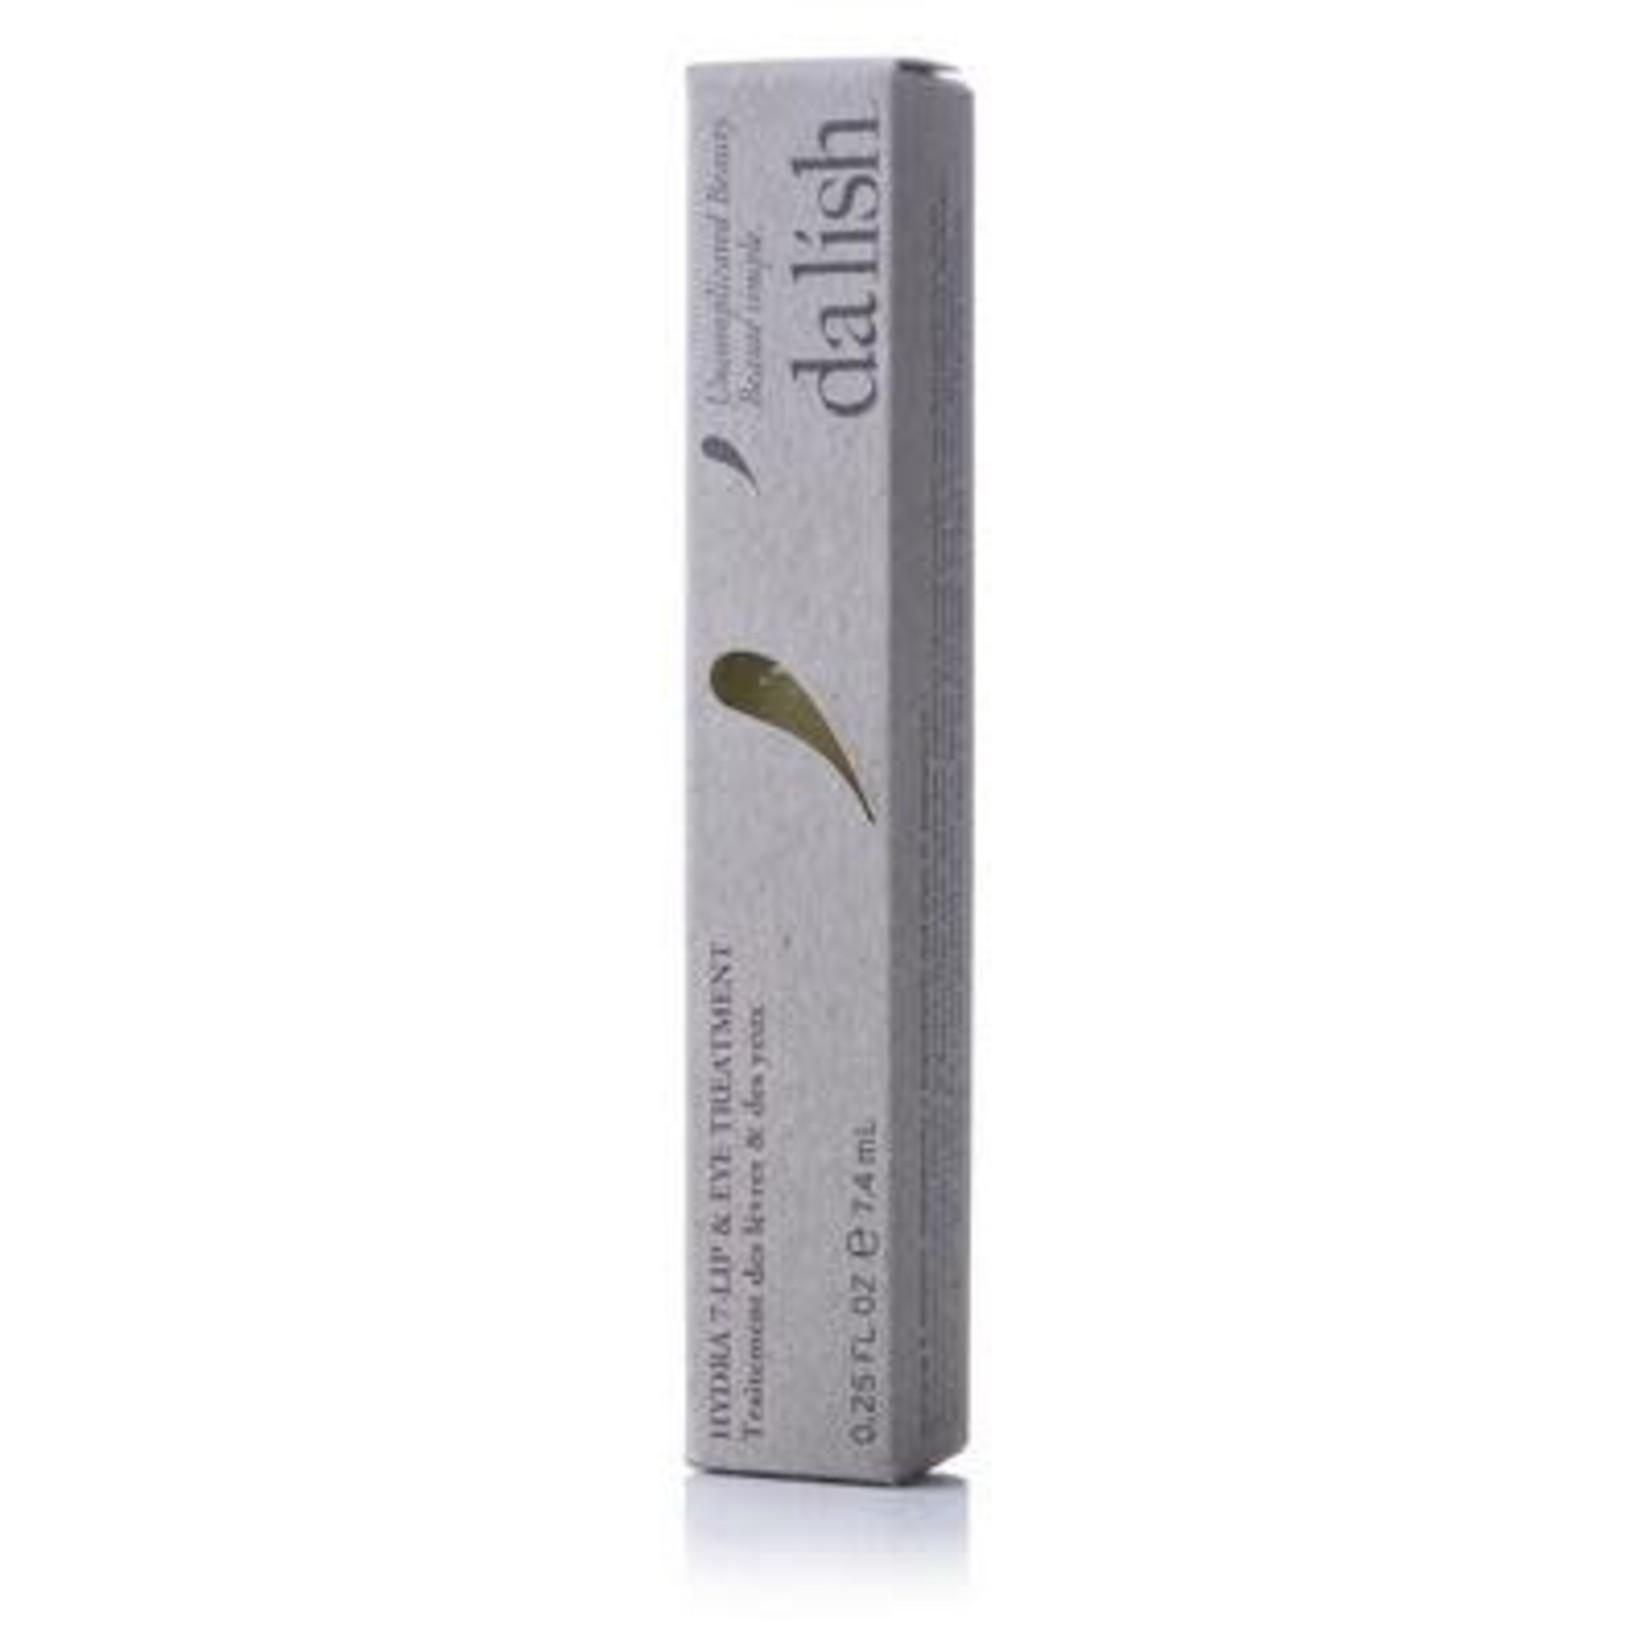 Dalish Hydra 7 Eye and Lip Treatment